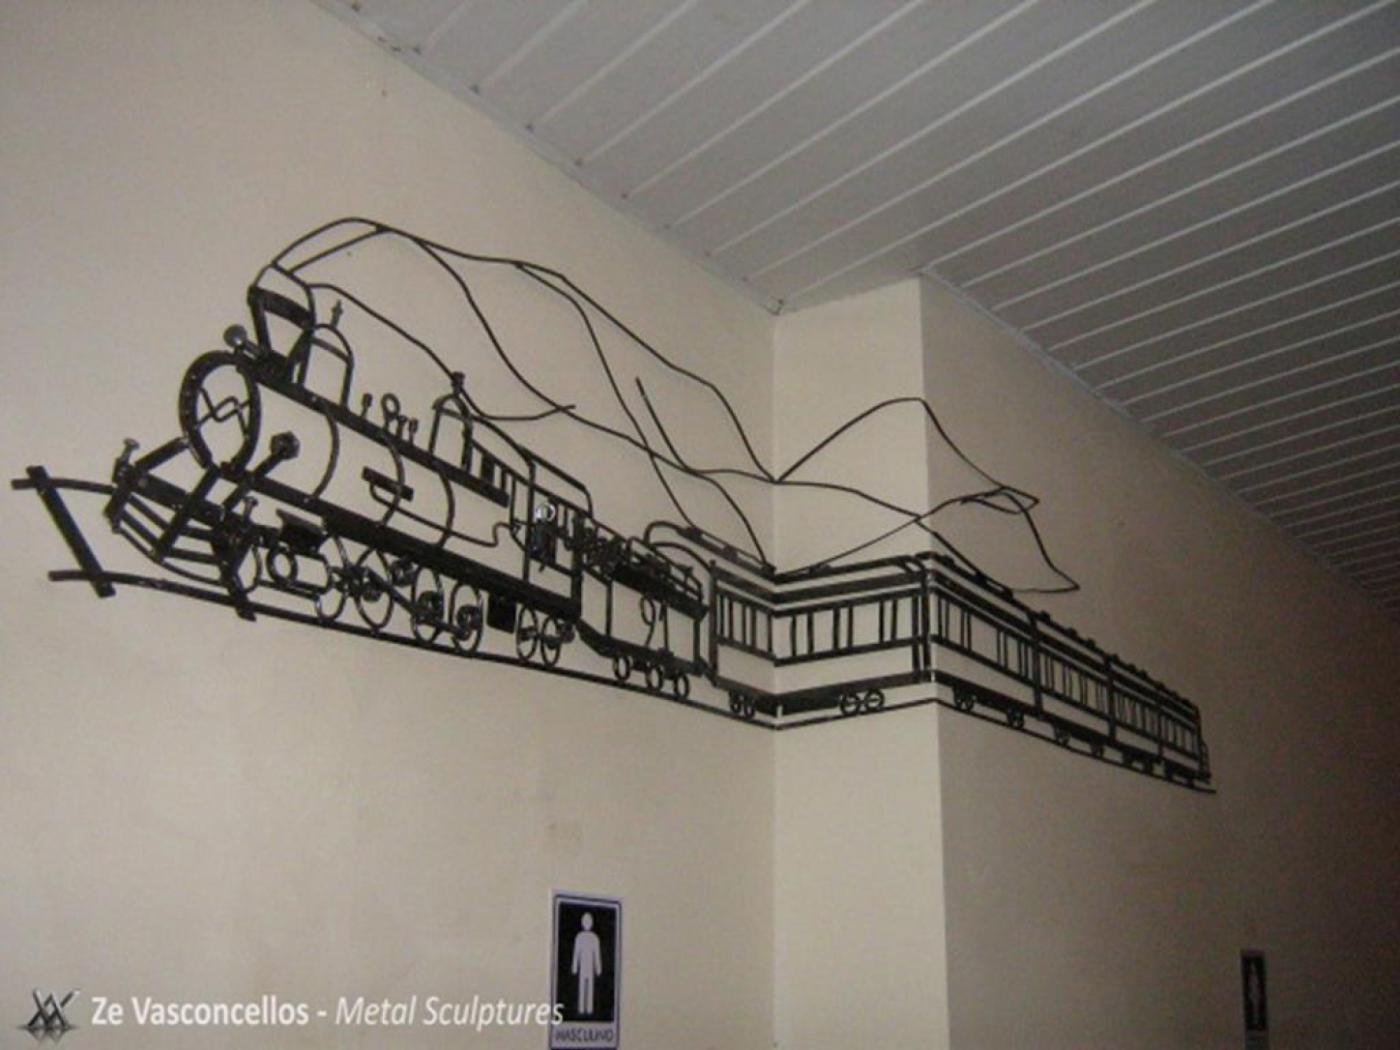 Maria Fumaça - Old locomotiveZe Vasconcellos Metal Sculptures - Metal Sculptures - Campinas - São Paulo - Brasil Esculturas em Metal, Metal Sculptures, Cavalo Metal, Horse Metal, Art Metal, Ze Vasconcellos Metal Sculptures